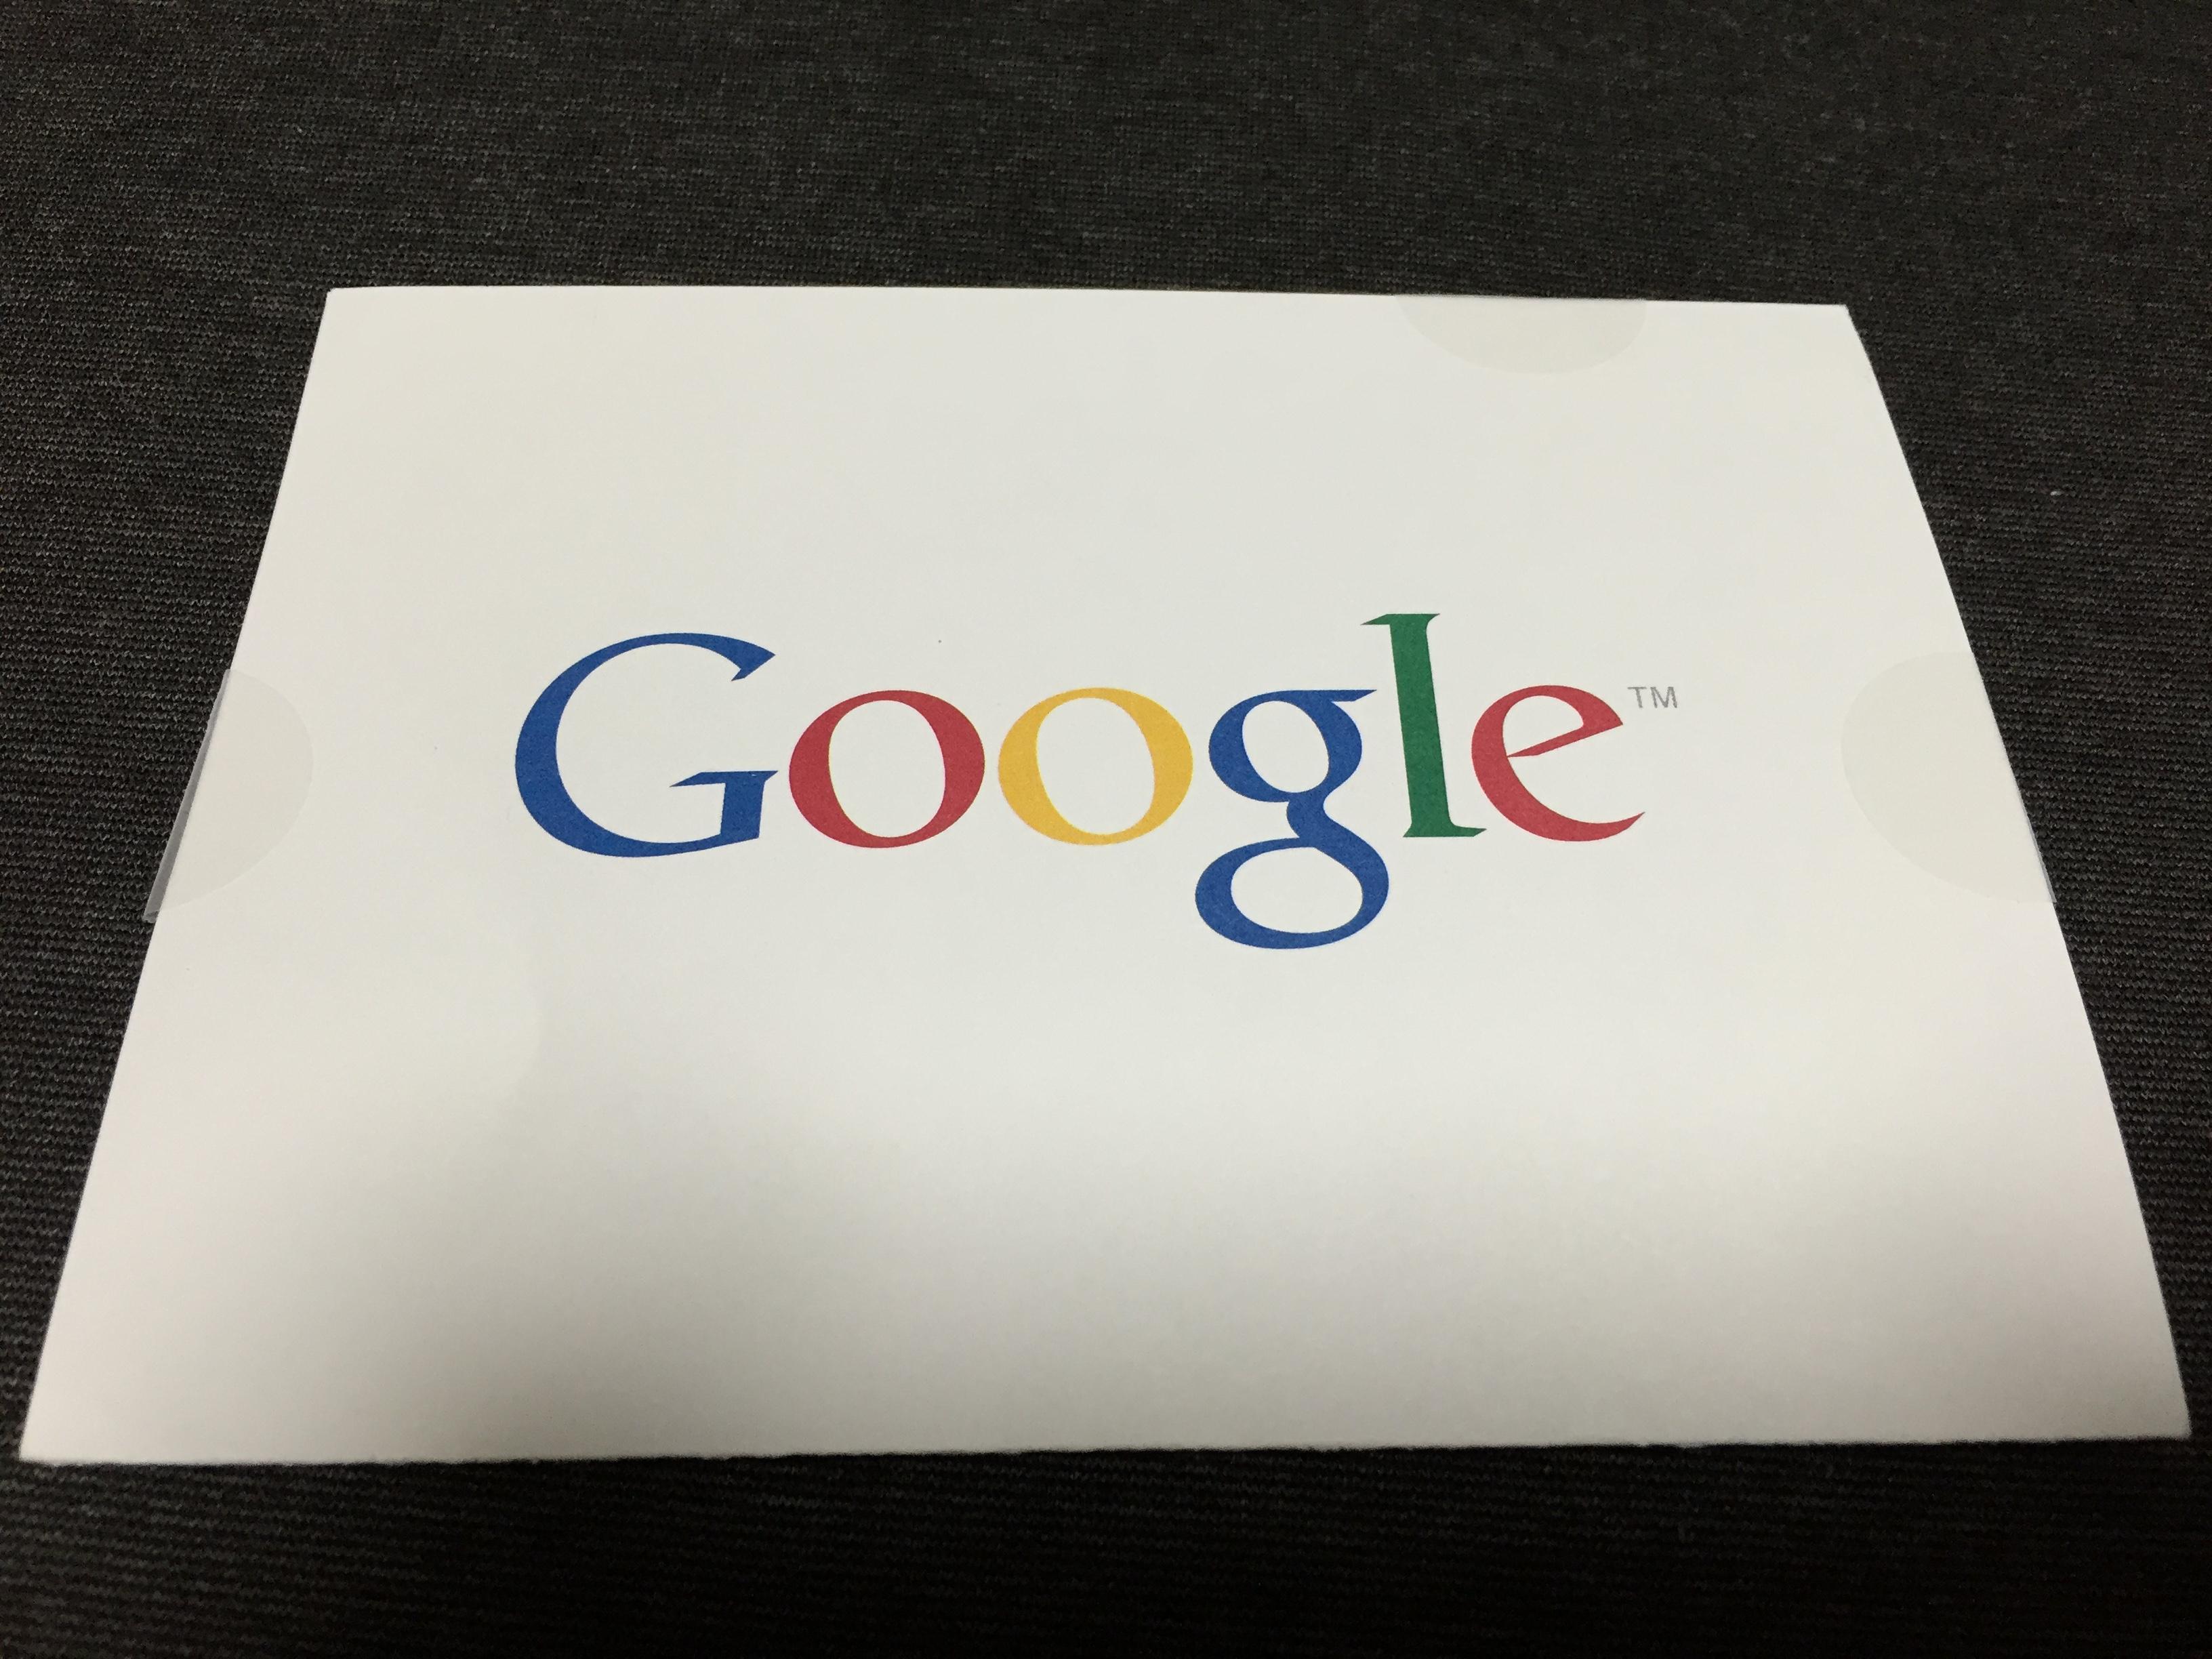 GoogleAdSenseからアフィリエイト報酬振込の為のPINコードが届いた!